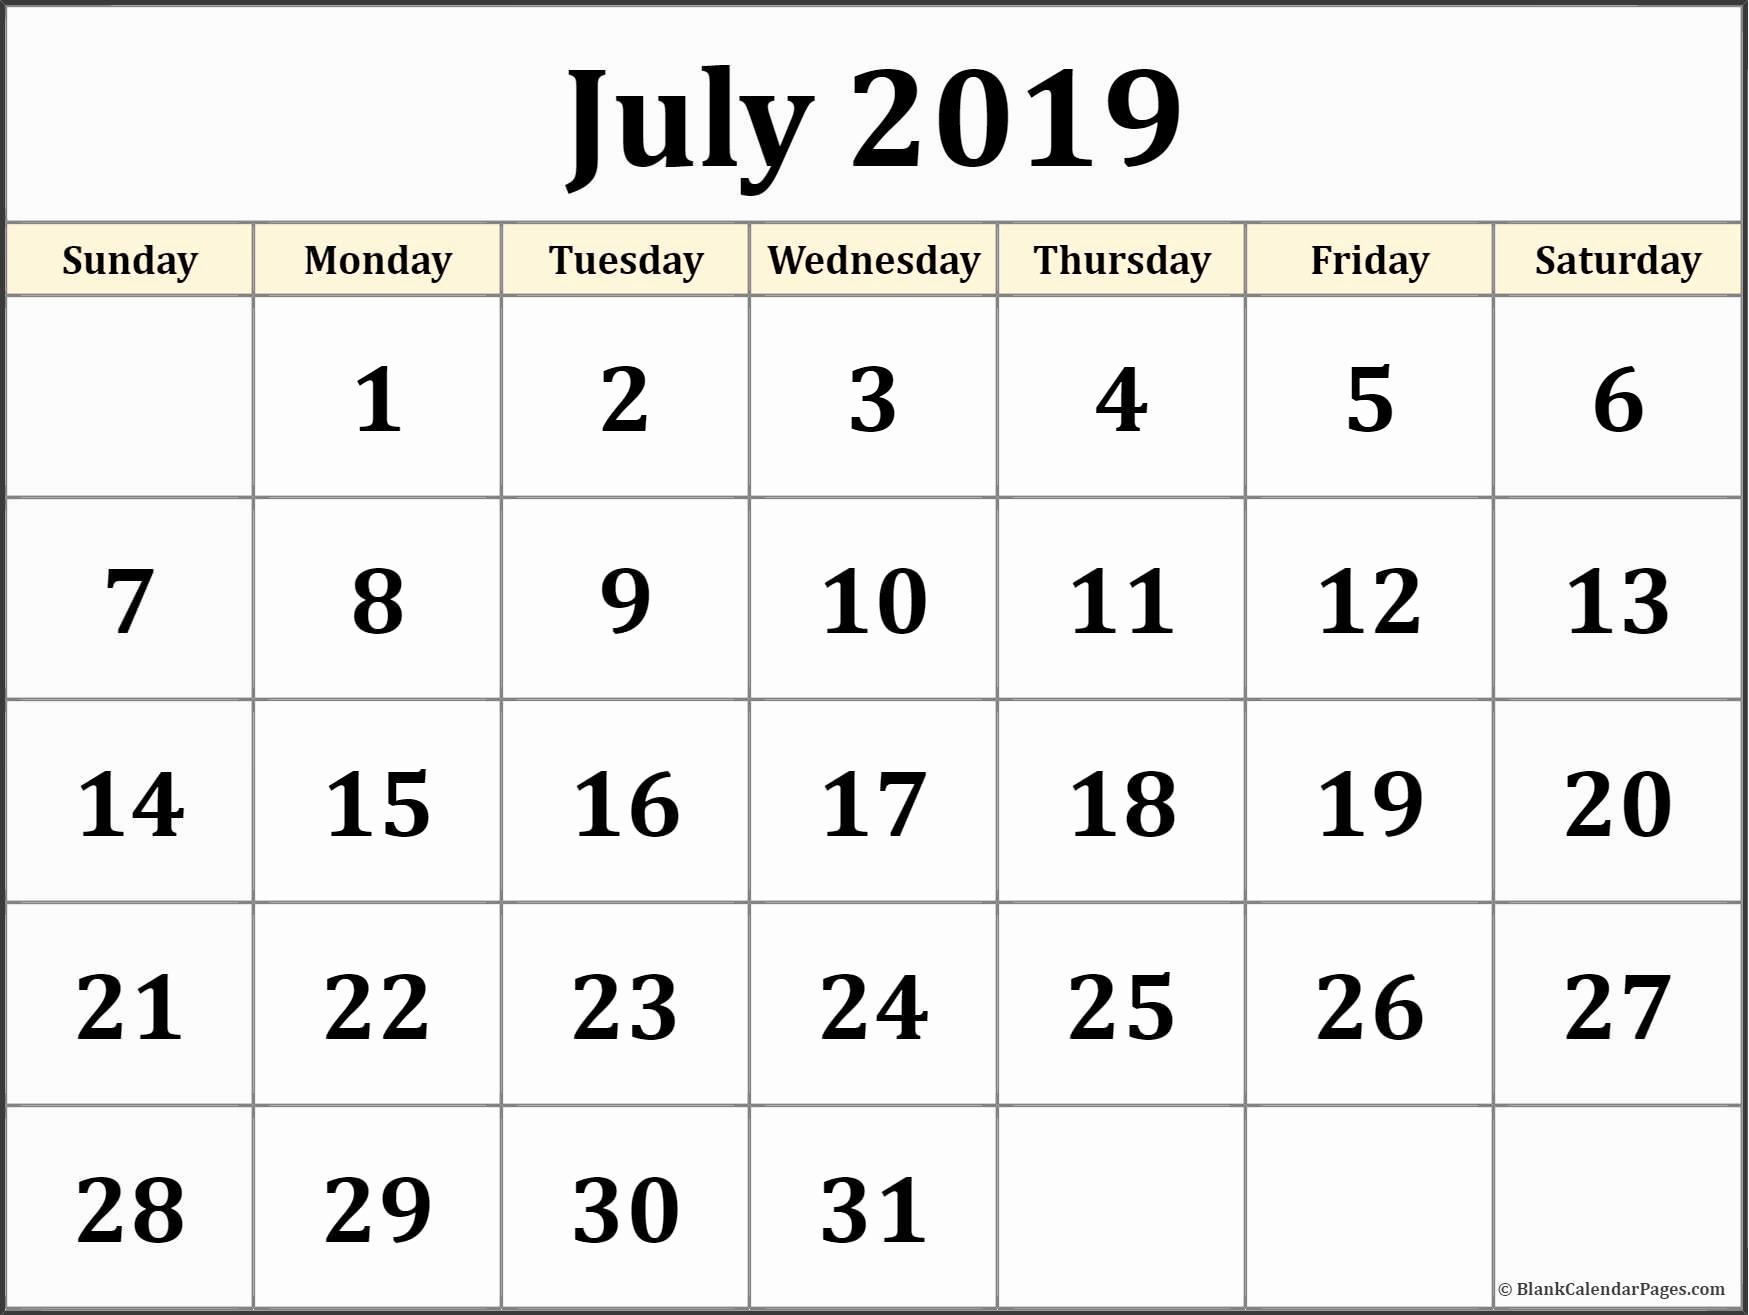 Blank Calendar Template July 2019